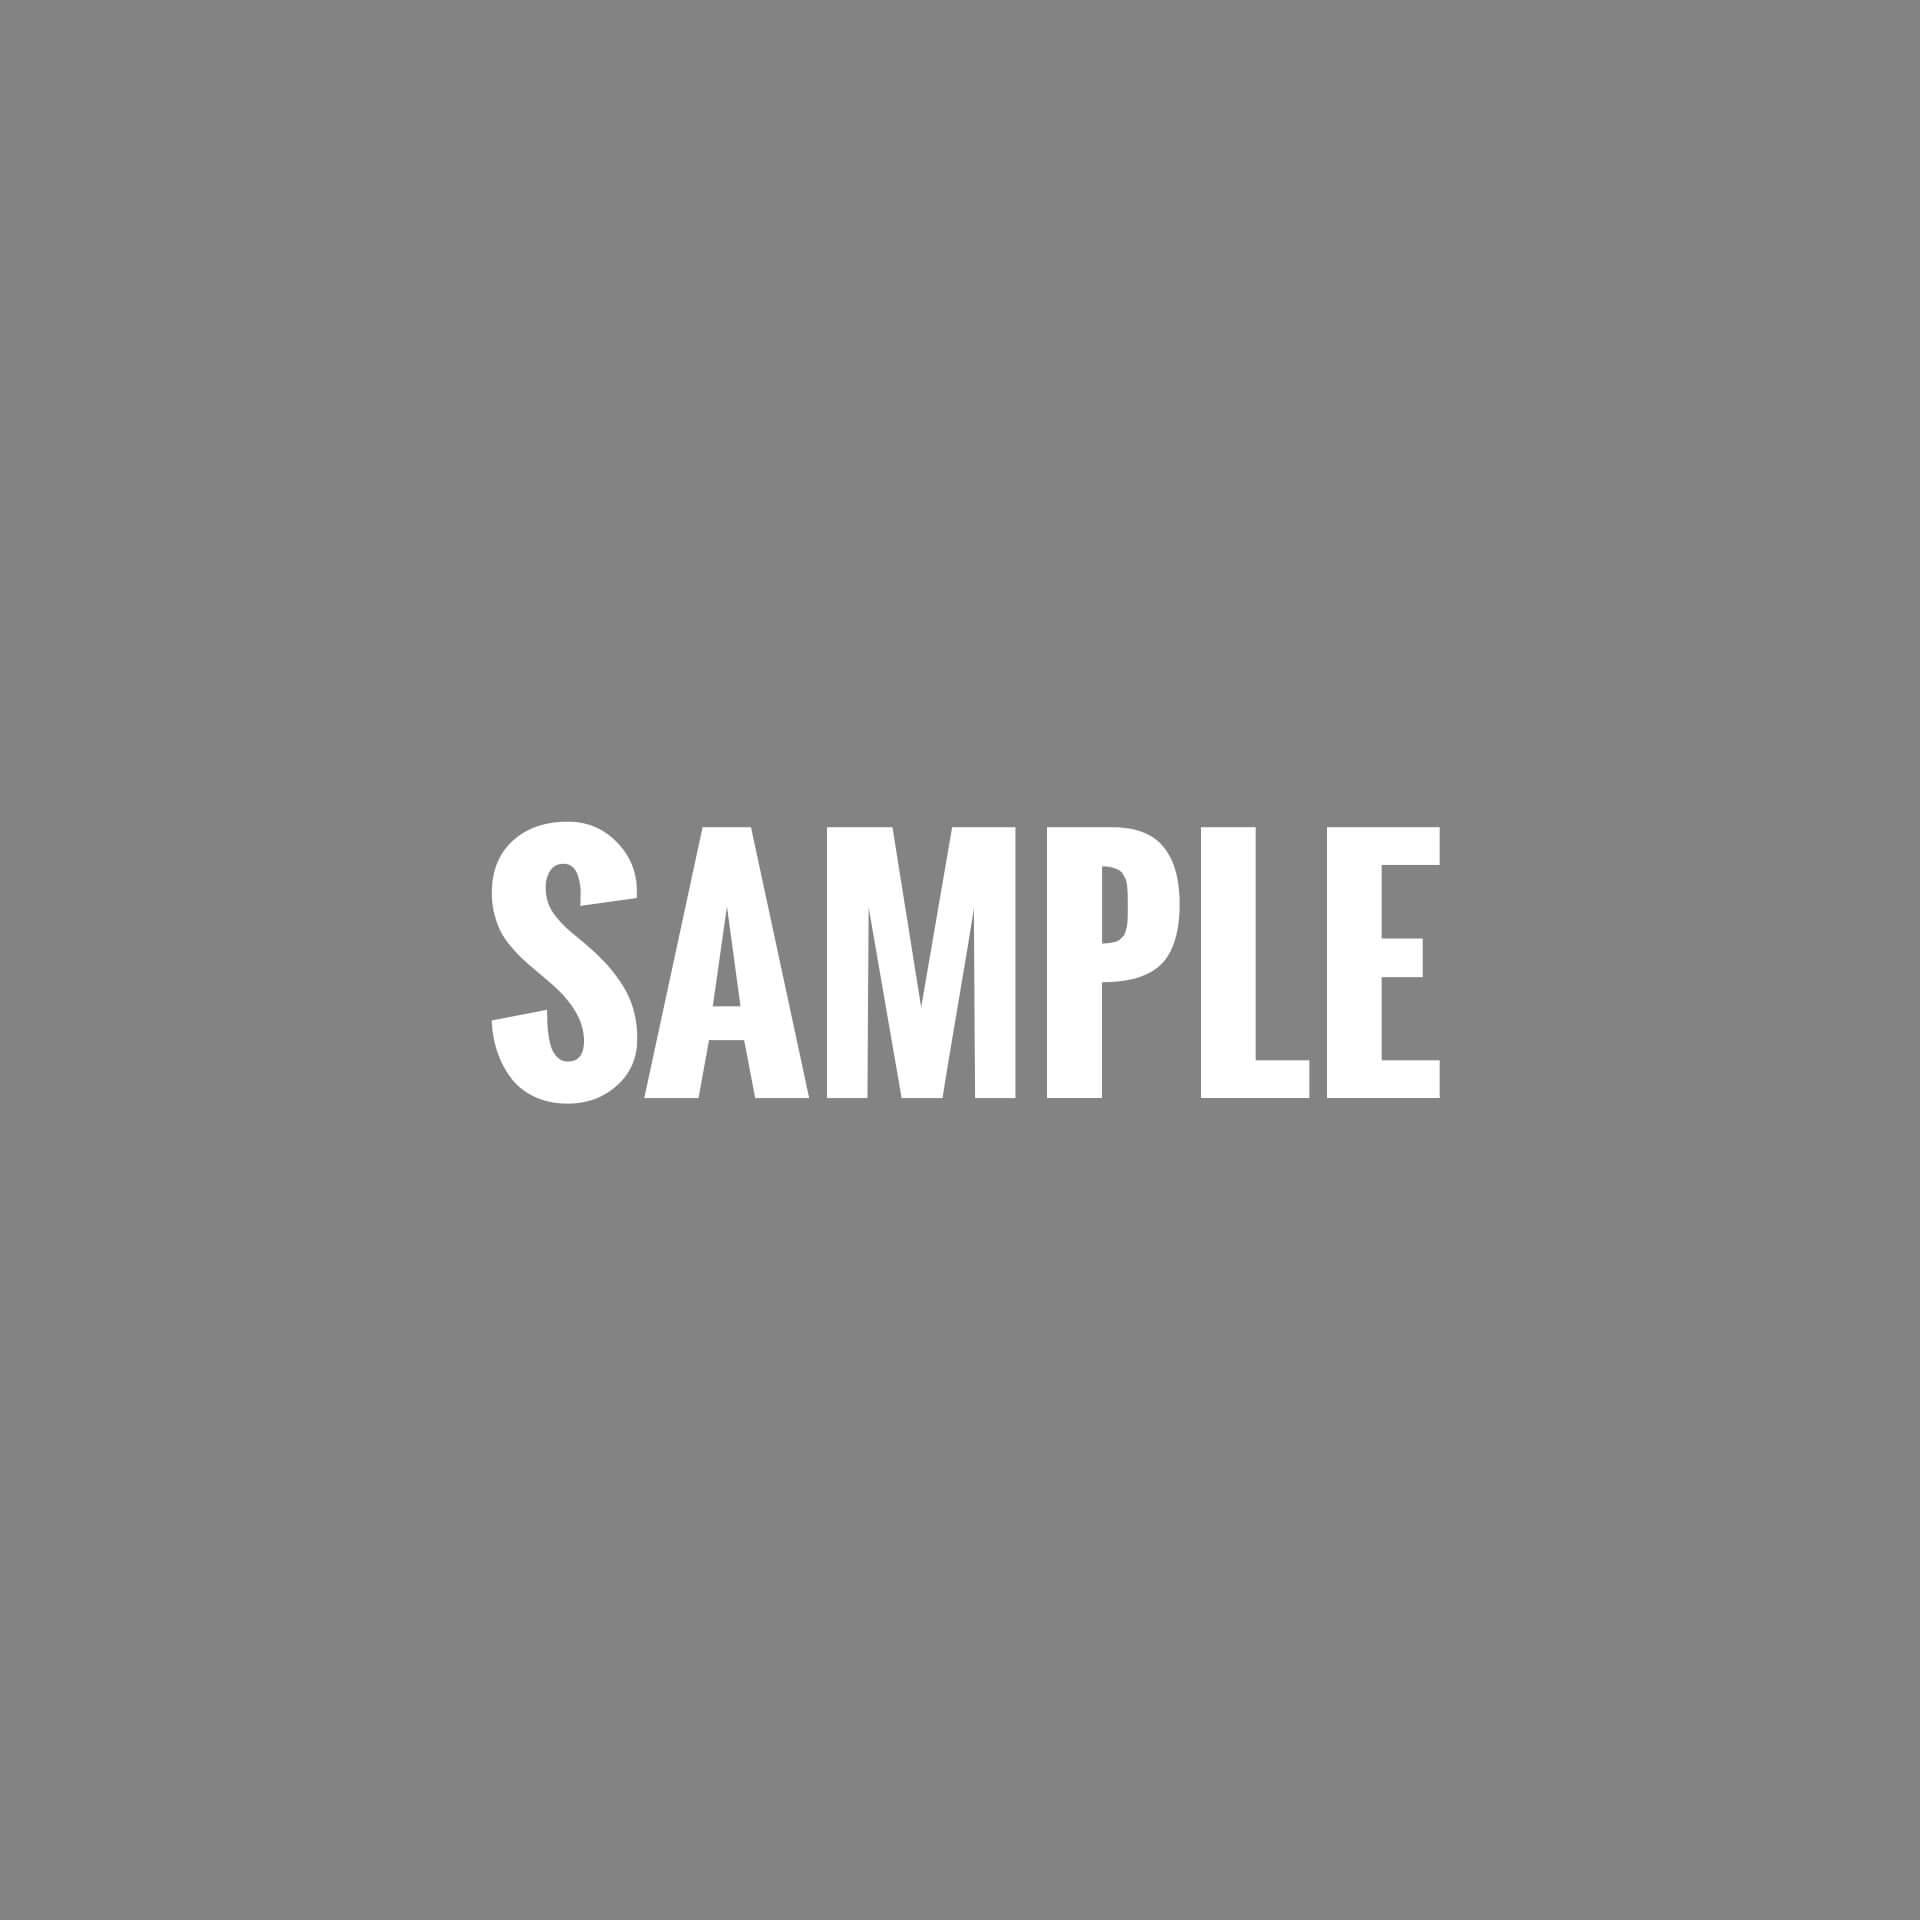 sample_4-1920x1920